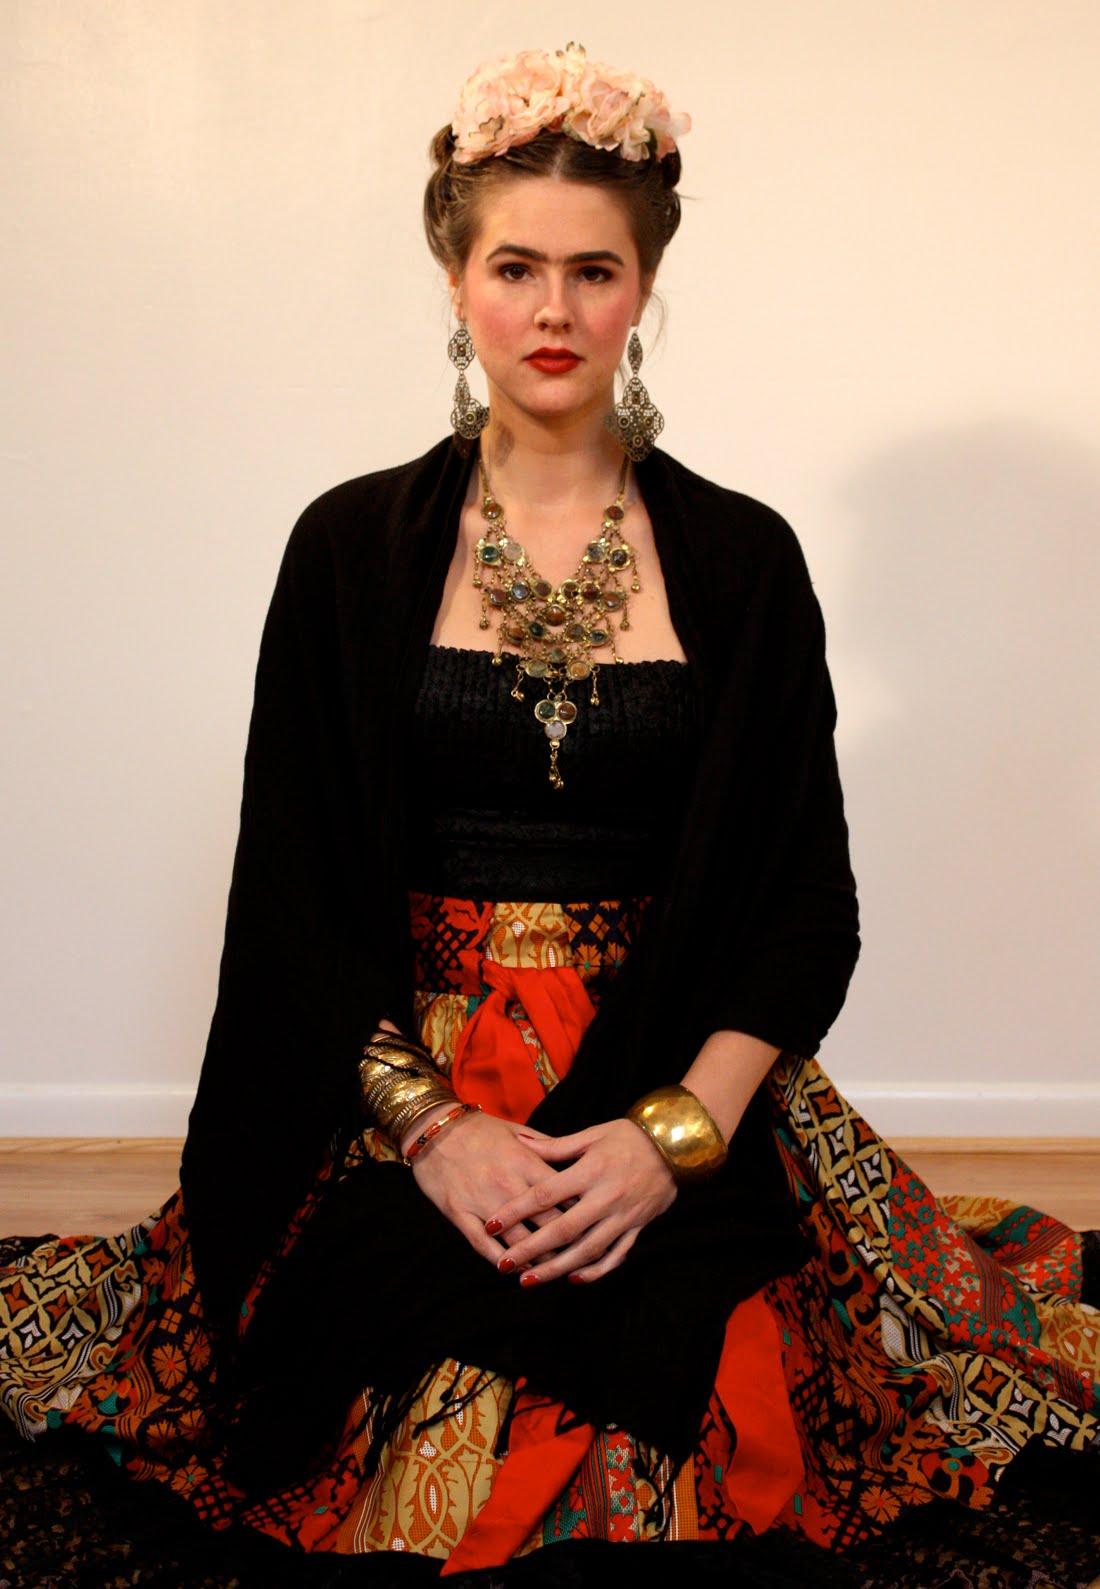 dorothy vacance frida kahlo lovers all over the world